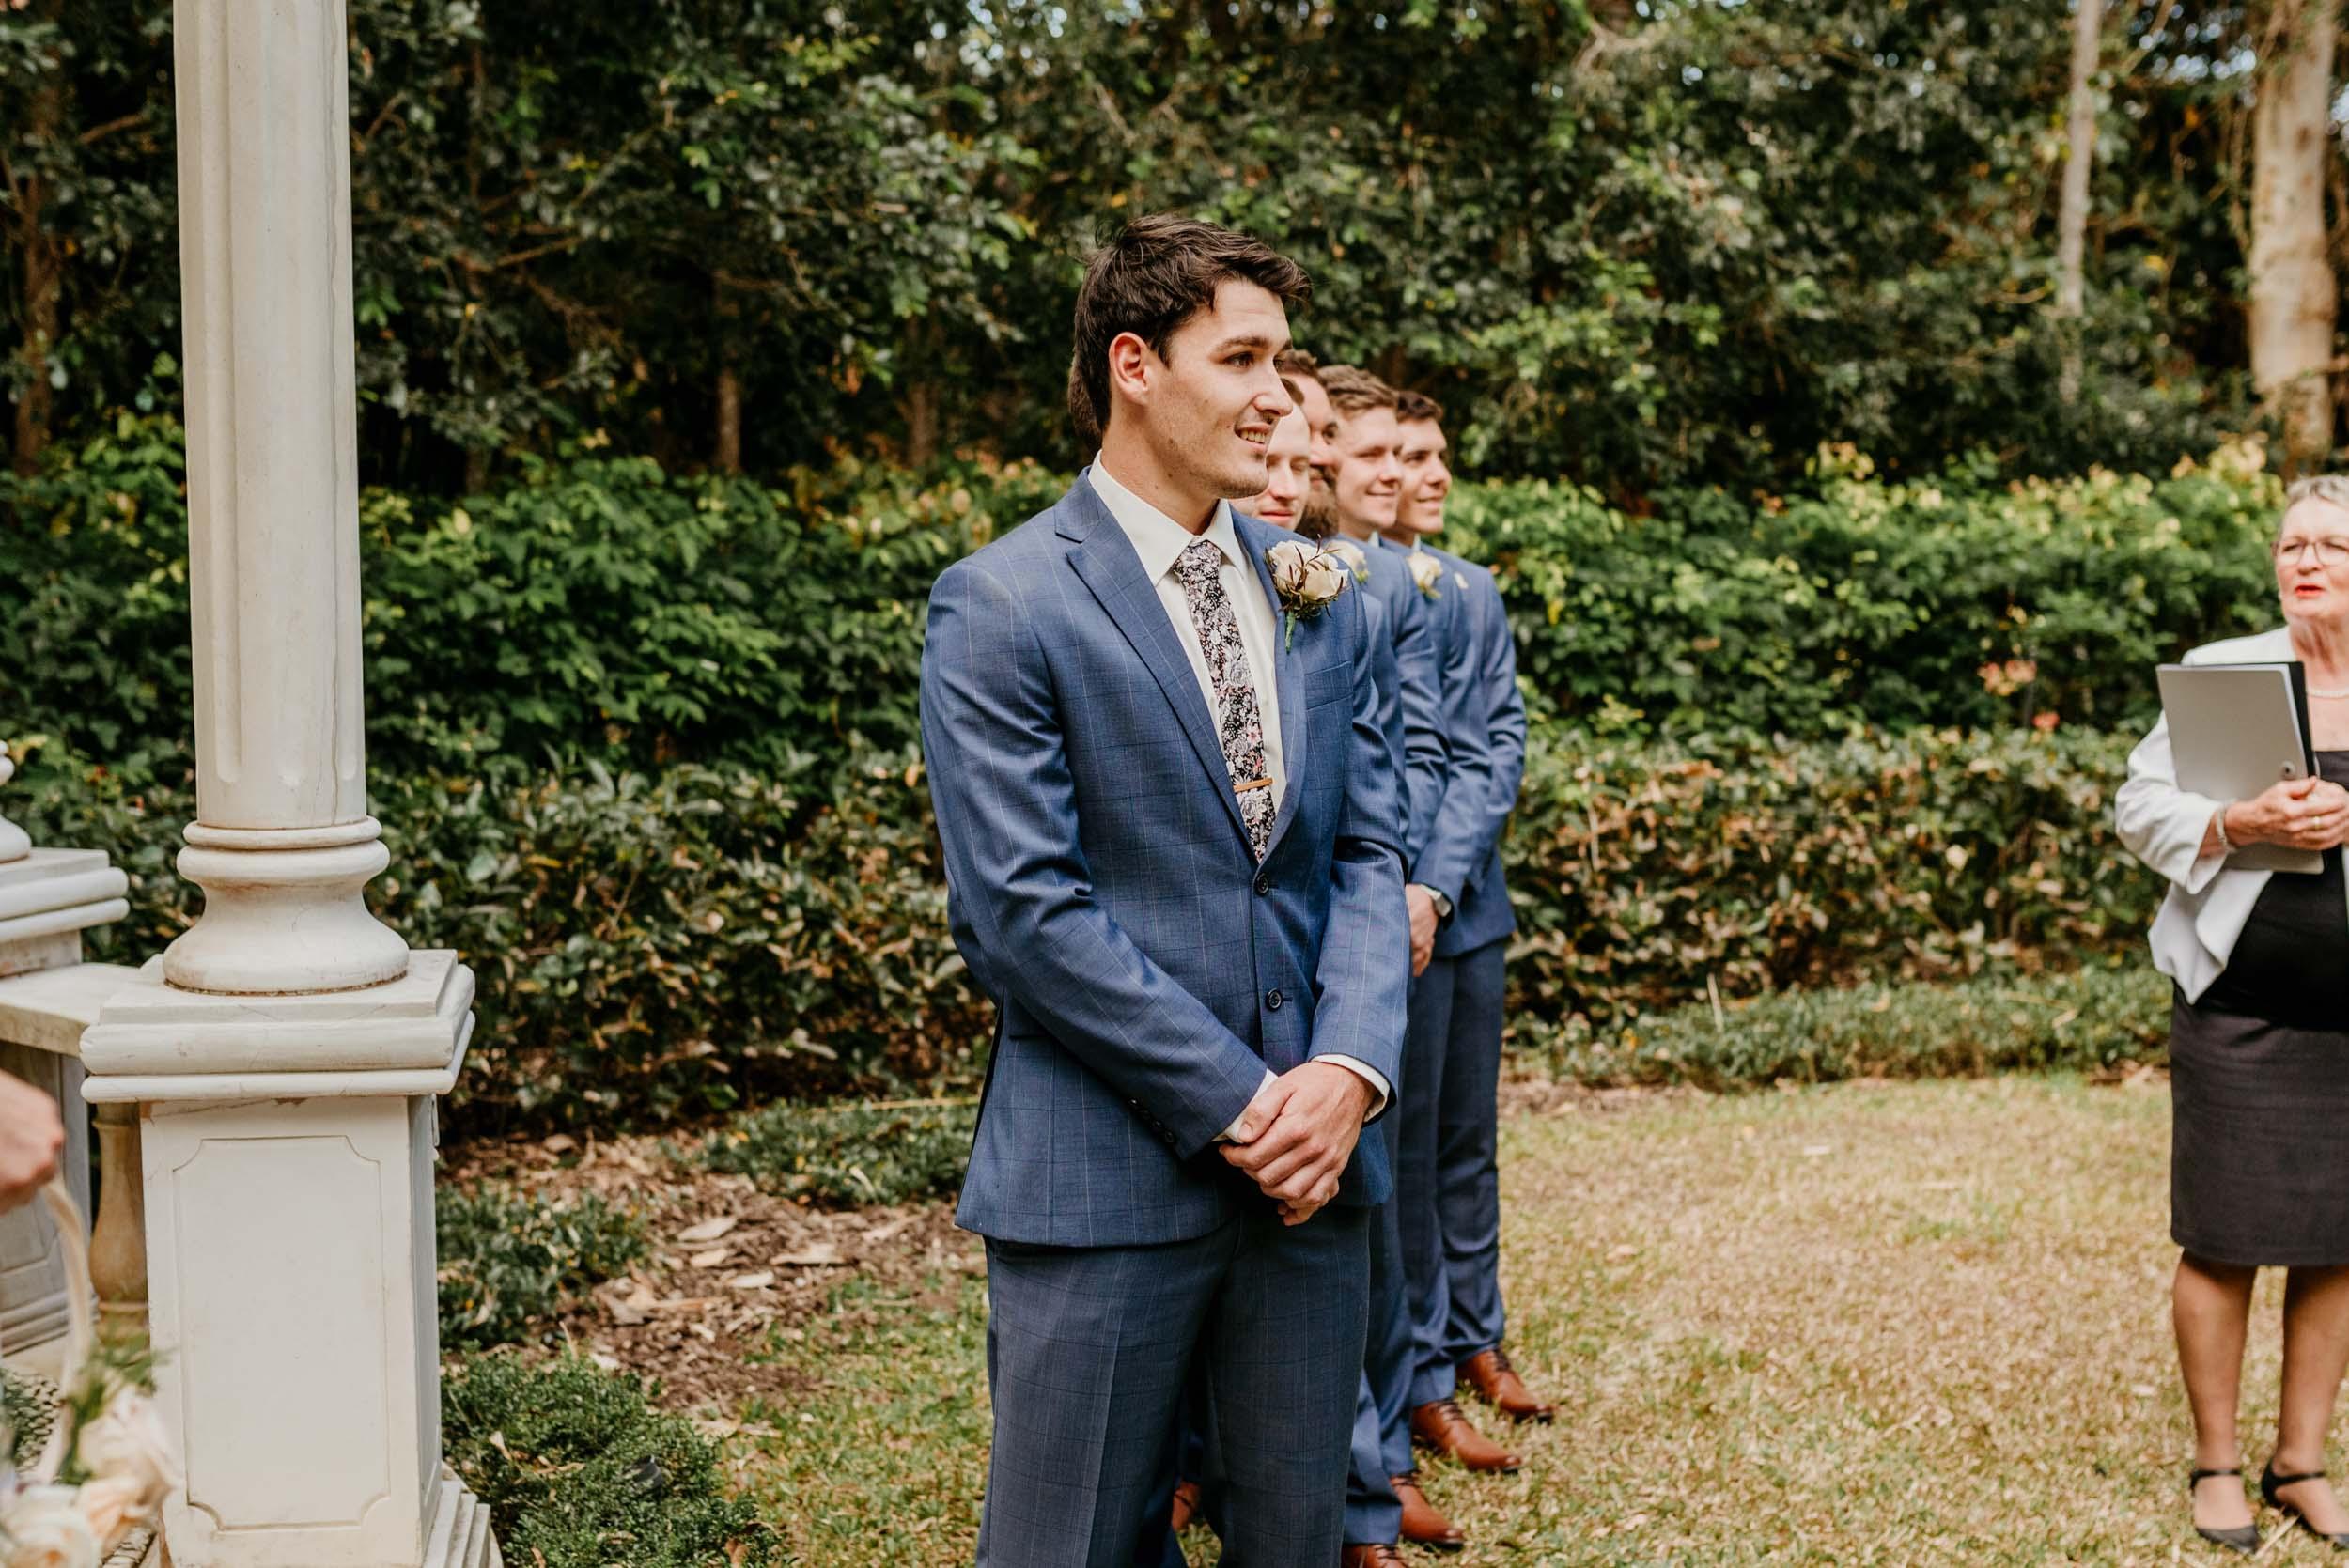 The Raw Photographer - Cairns Wedding Photographer - Laloli - Cairns Garden Wedding - Wedding Dress-32.jpg